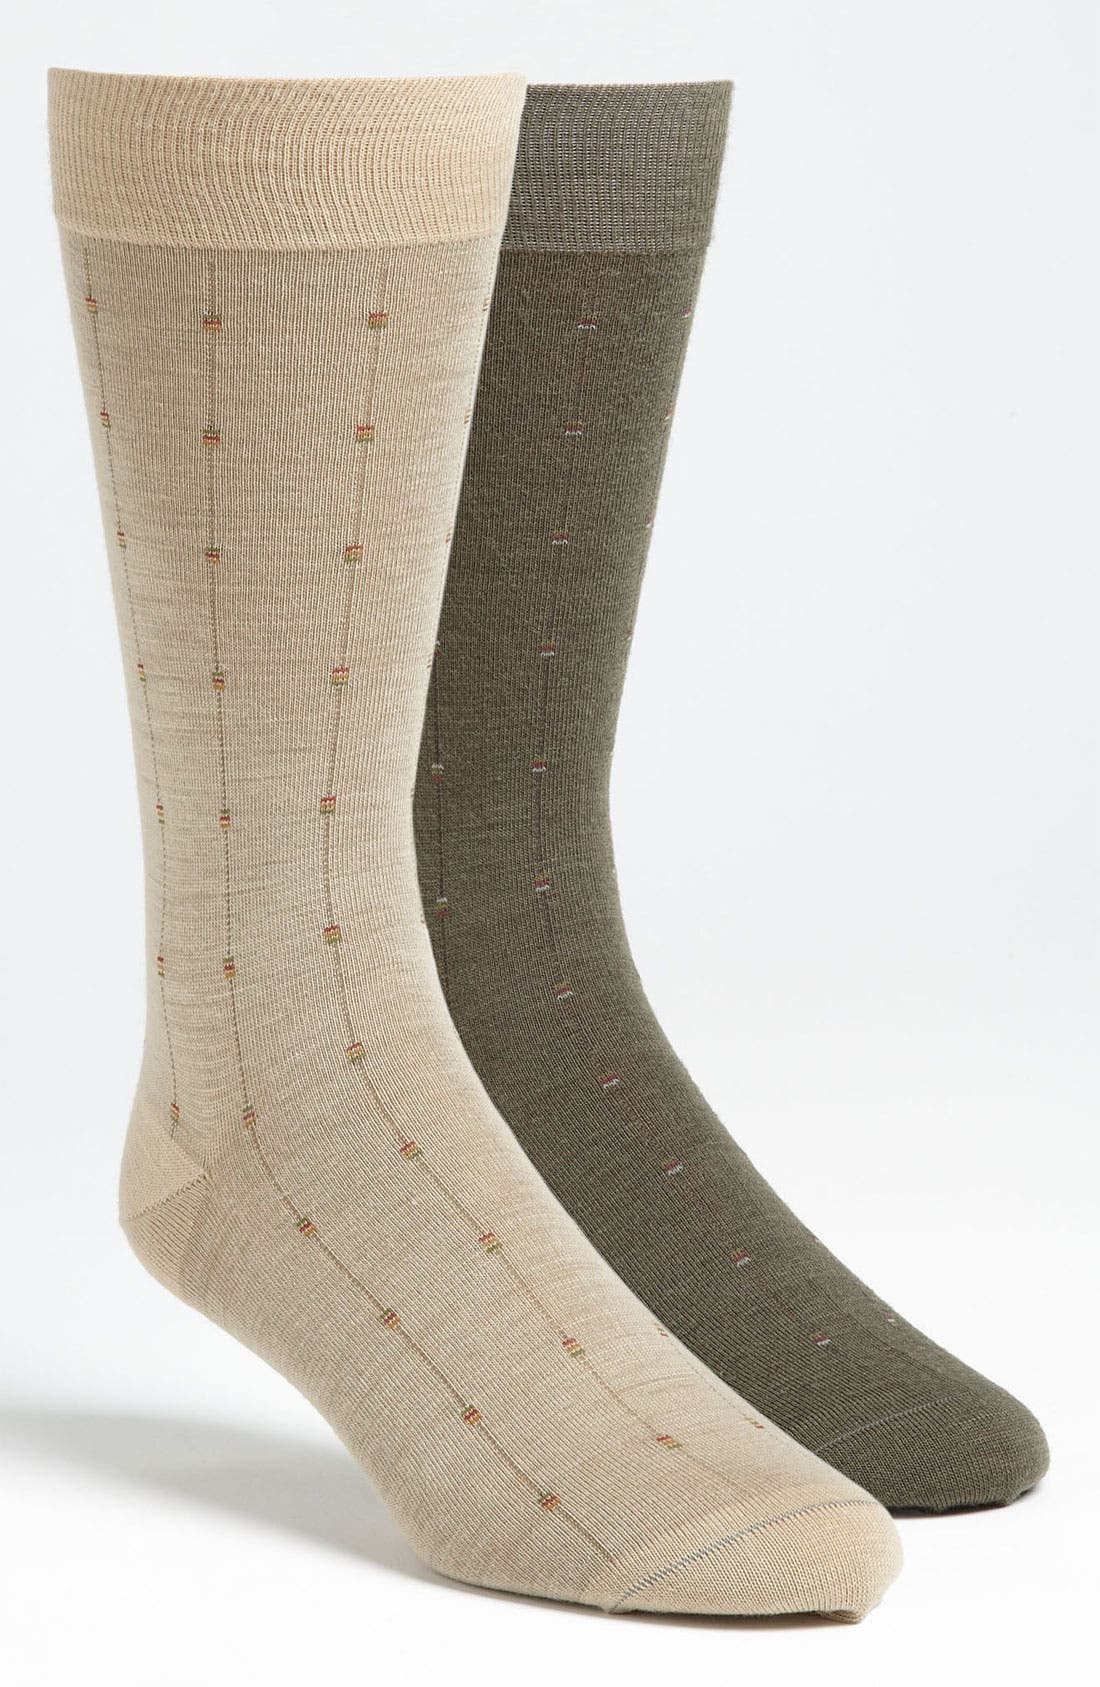 Alternate Image 1 Selected - Pantherella 'Bellringer' Socks (2-Pack)